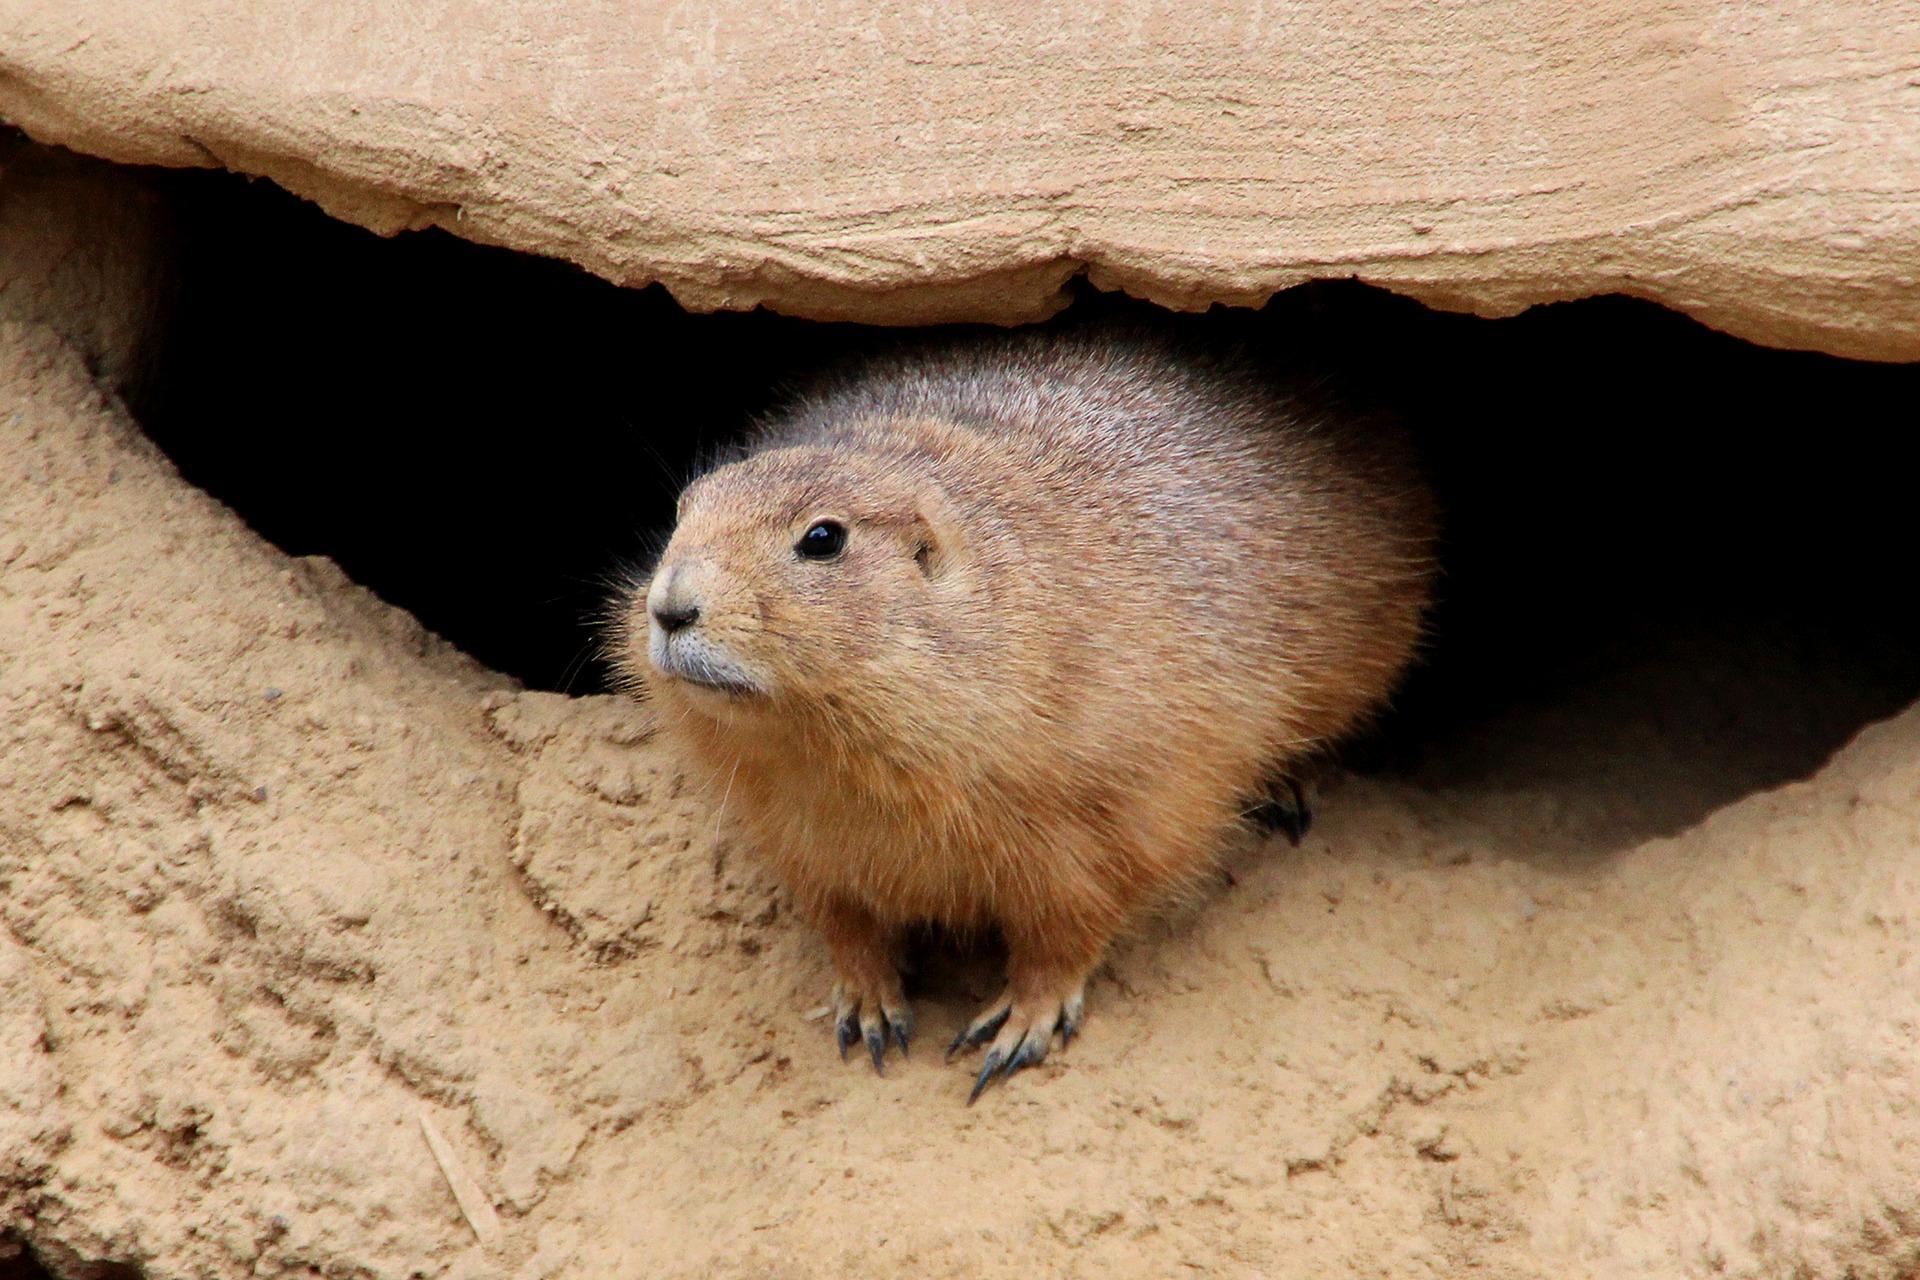 Groundhog leaving burrow.